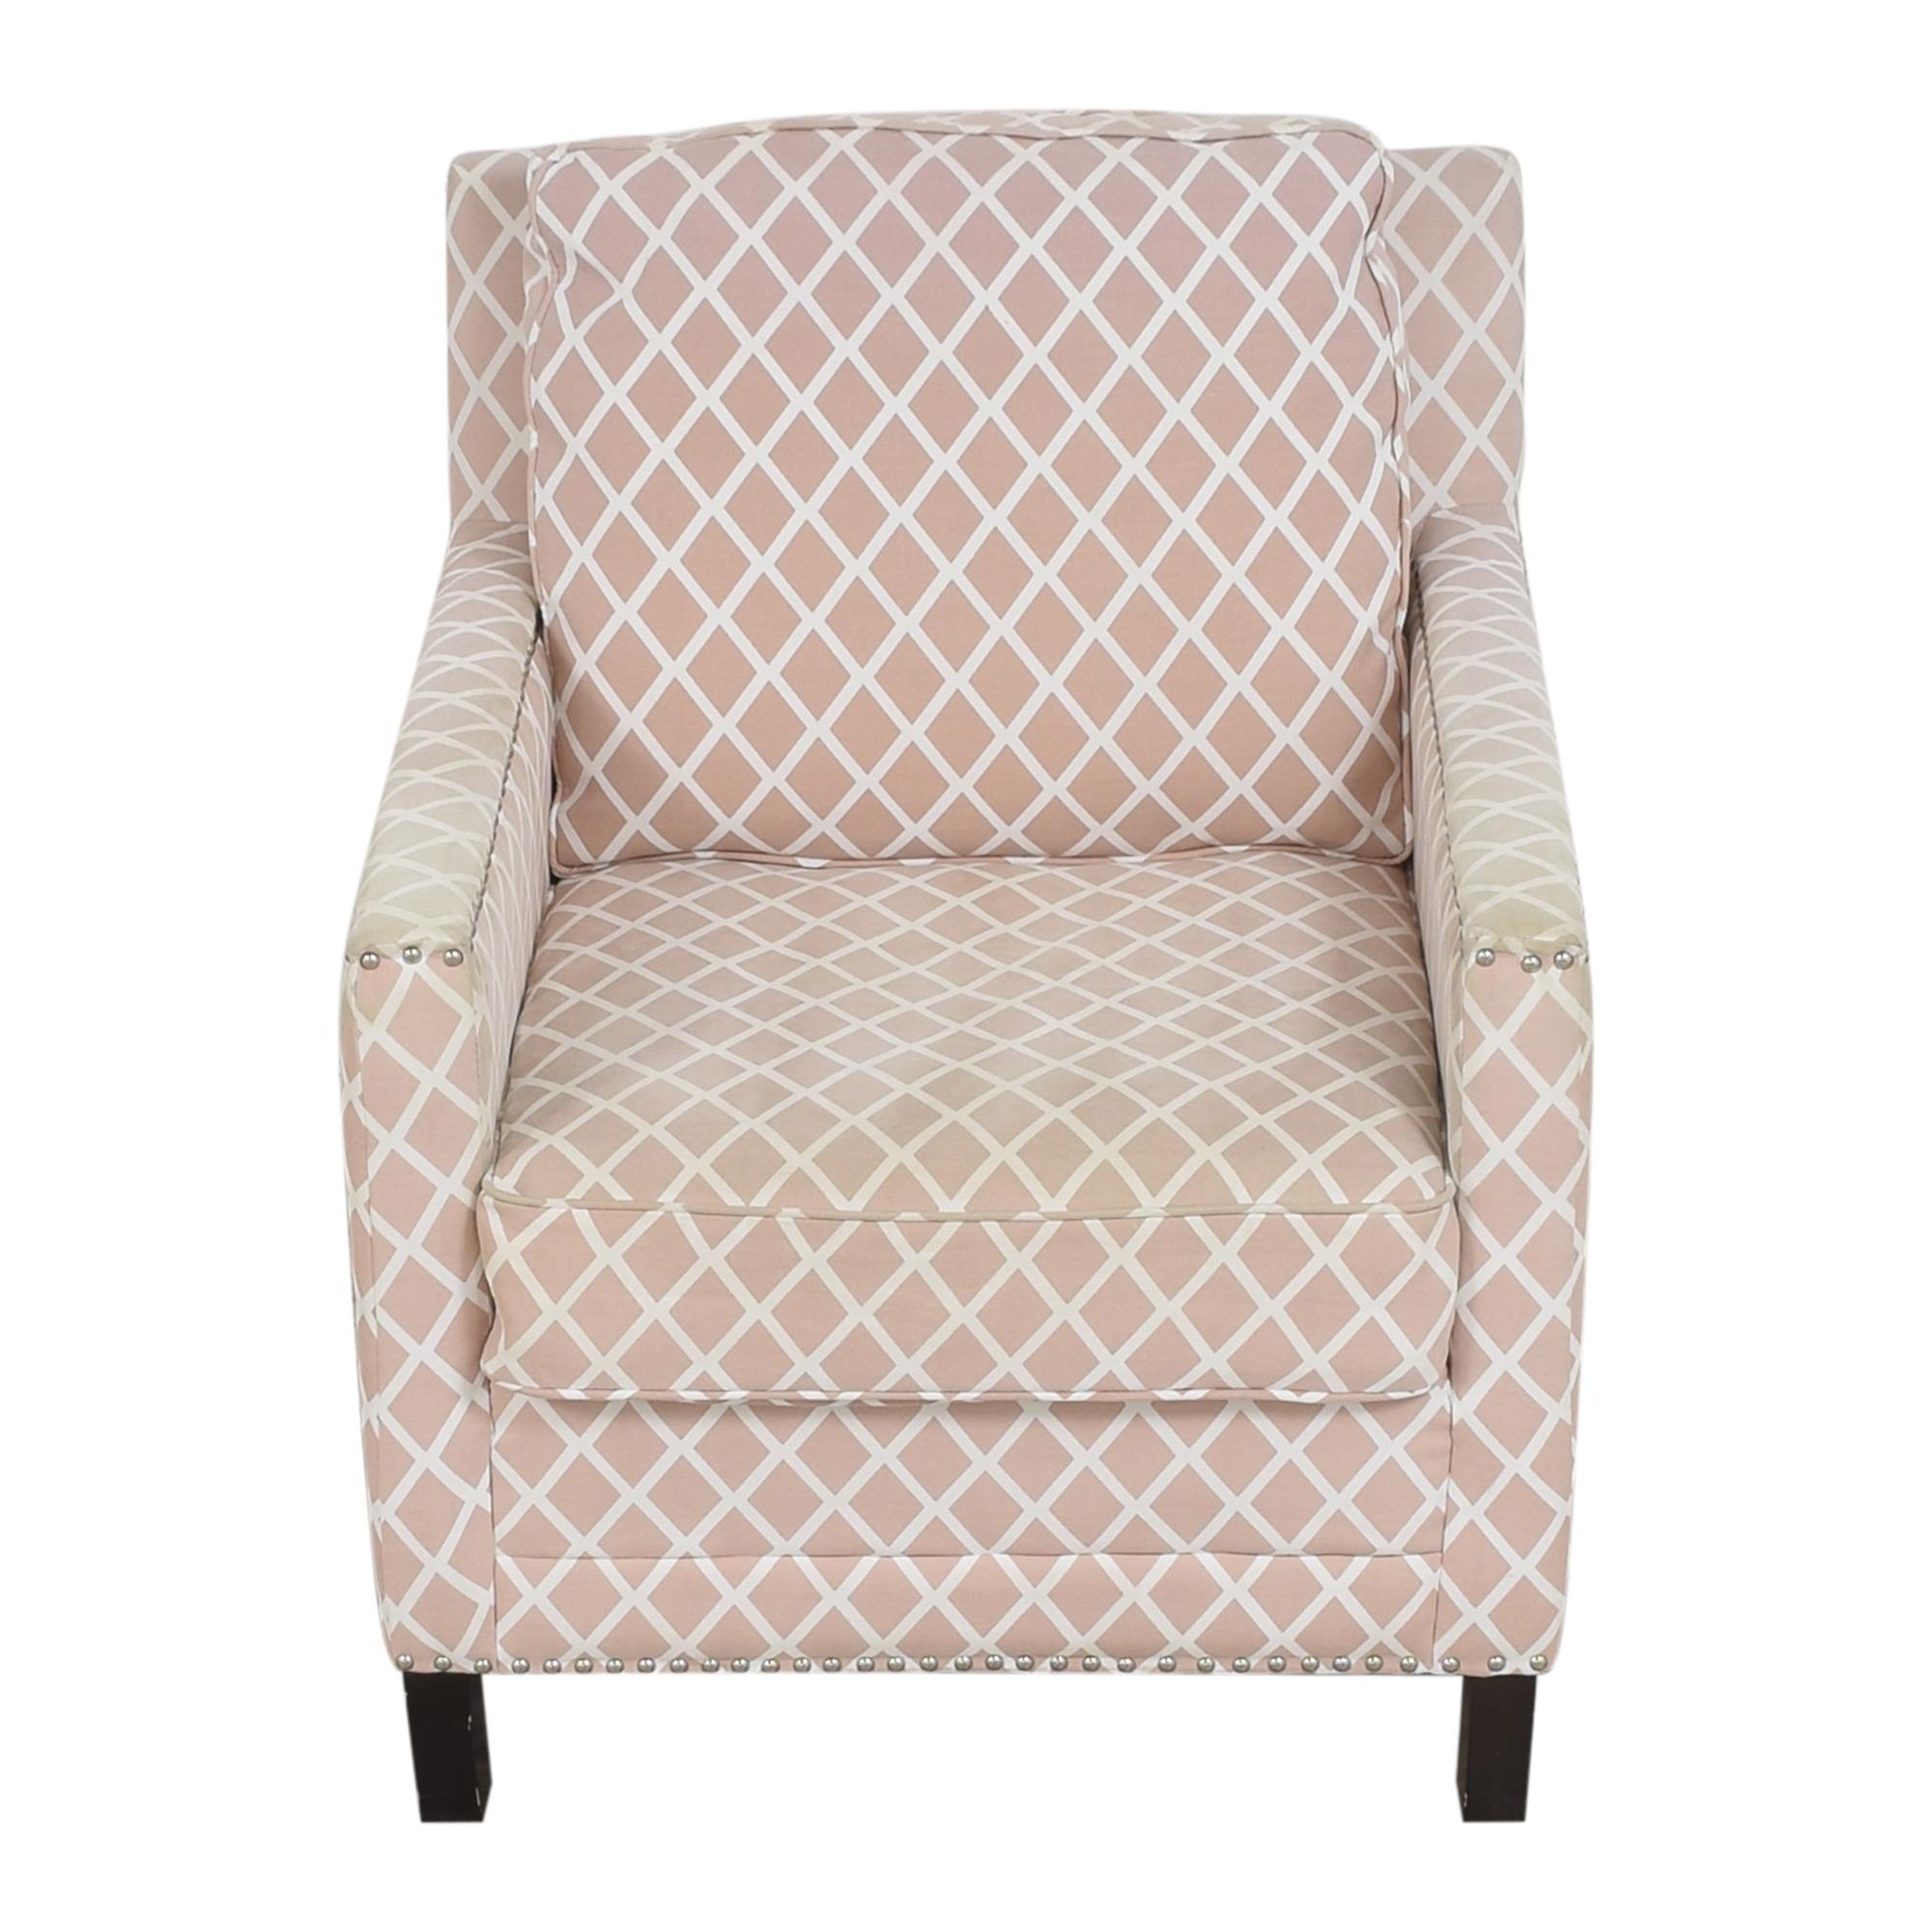 Safavieh Safavieh Buckler Accent Chair Accent Chairs